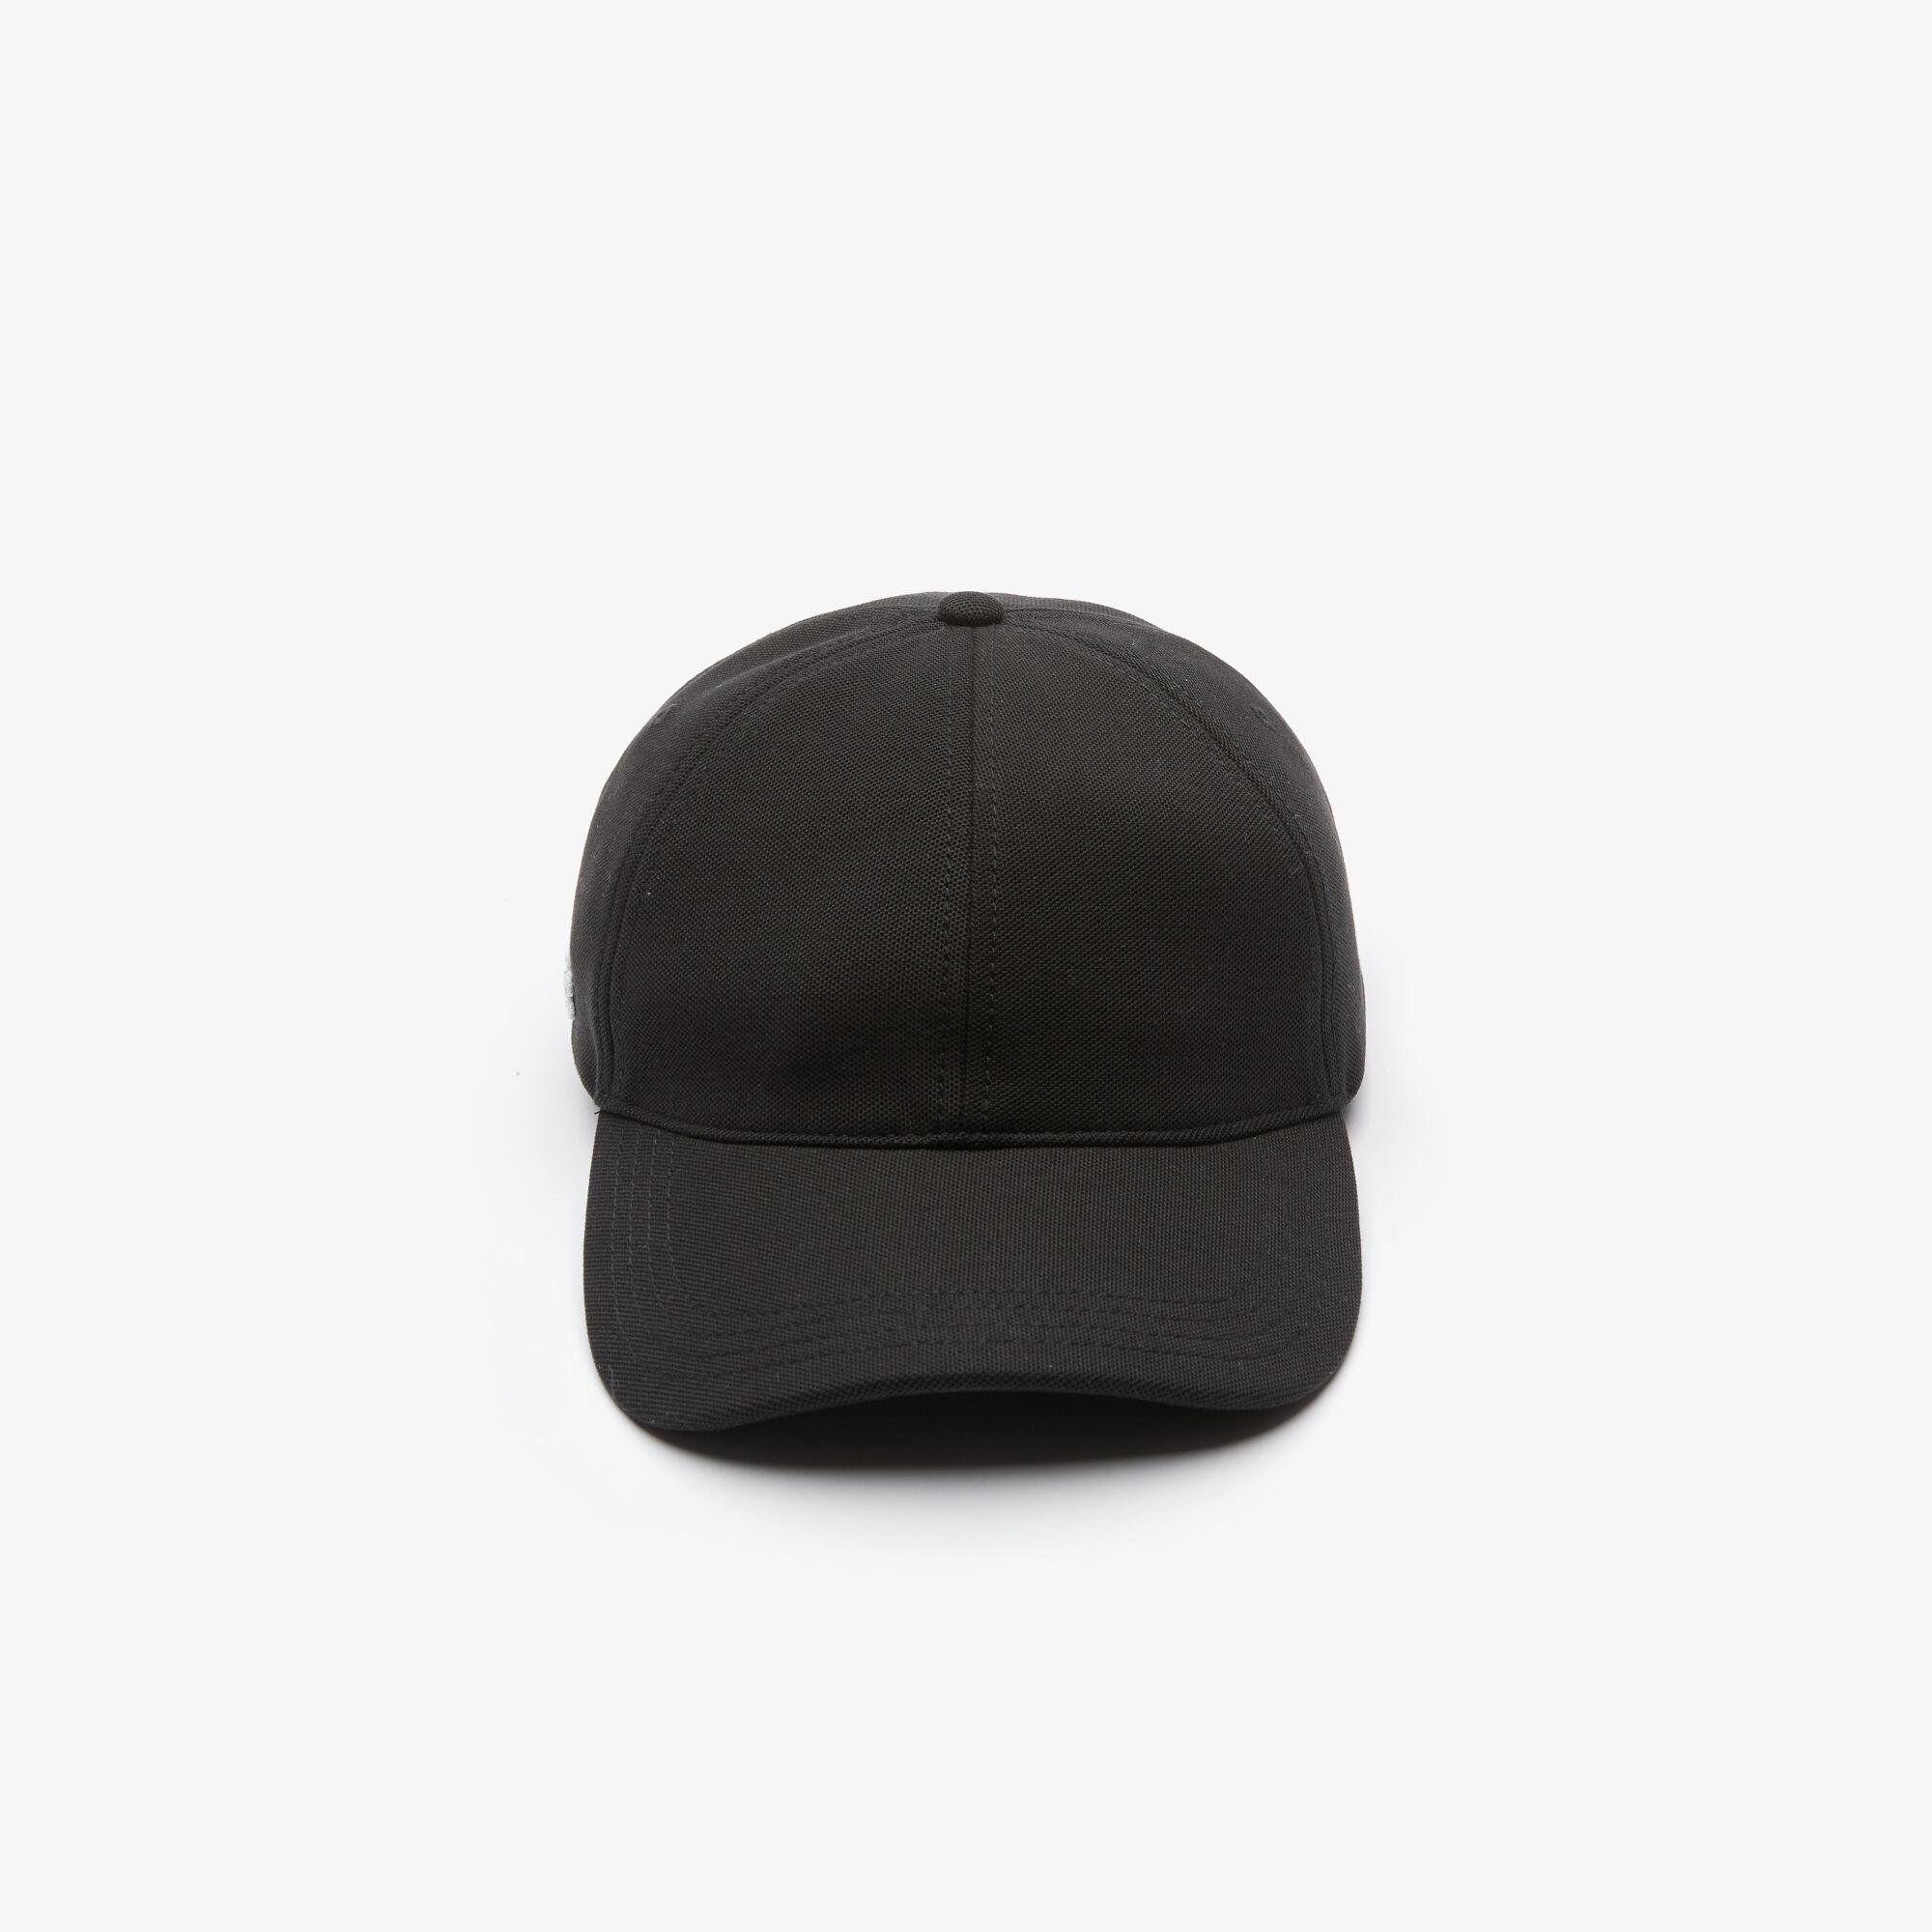 Men's Organic Cotton Piqué Cap